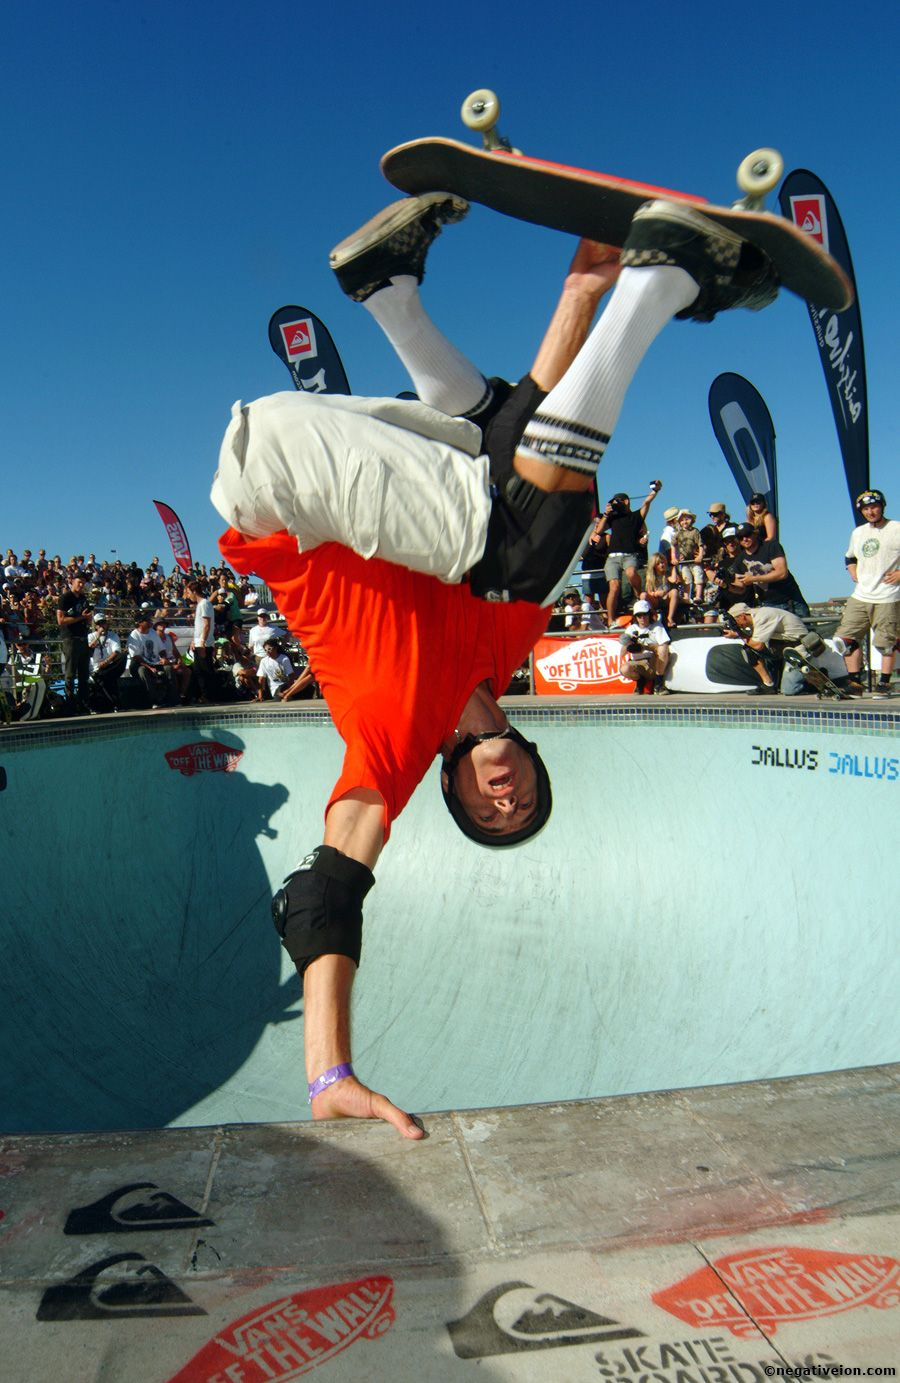 Skateboarding Tricks Ollie Adam luxford owns a skateboard